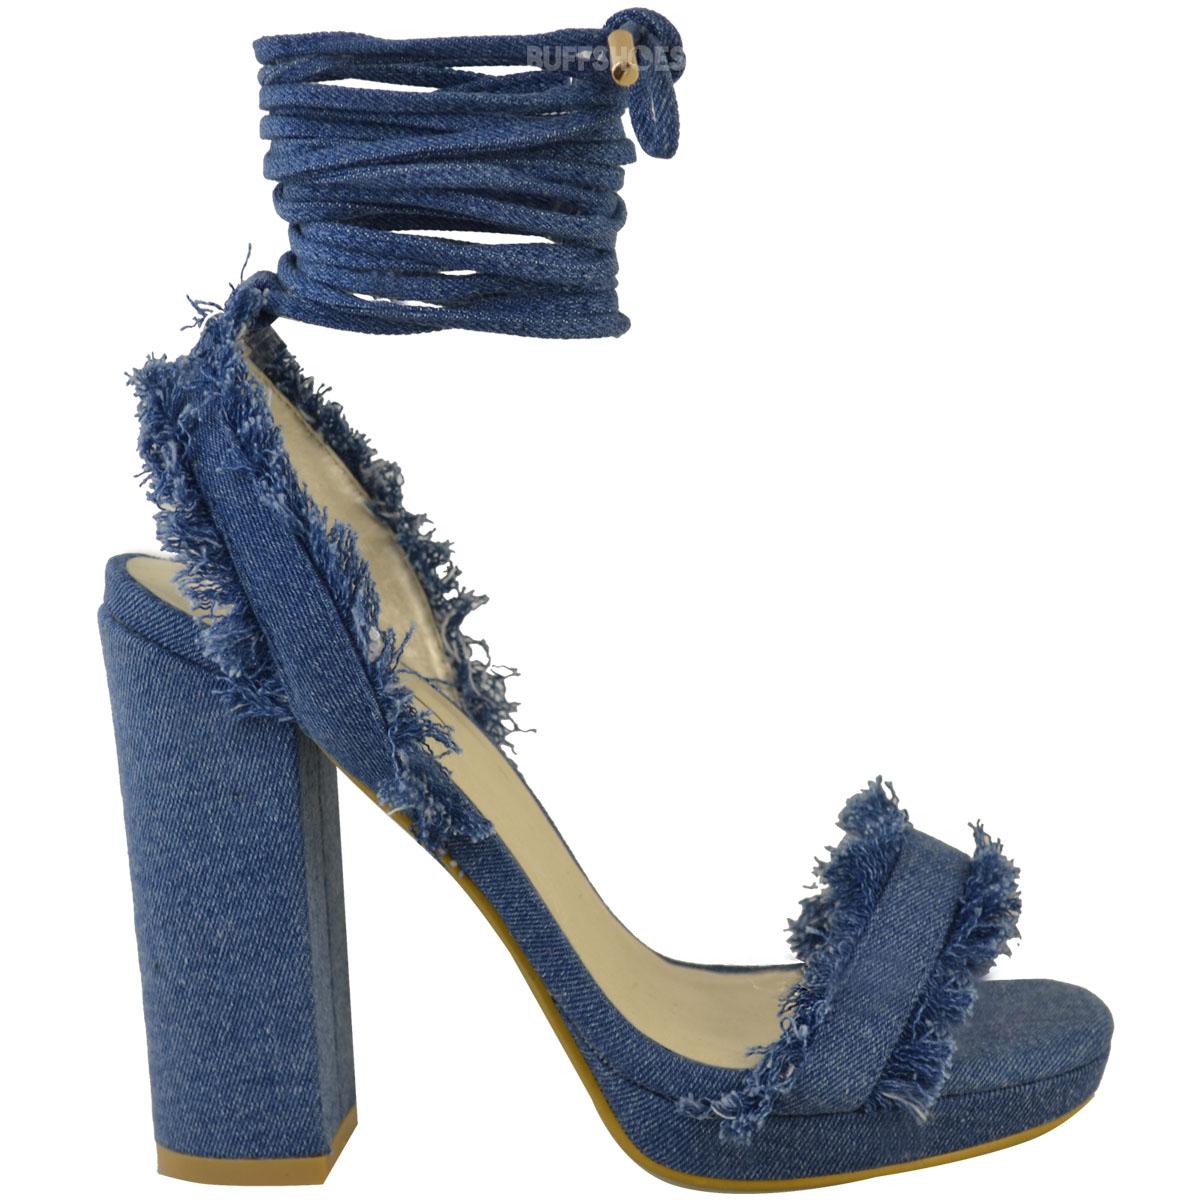 womens denim block high heels sandals lace up